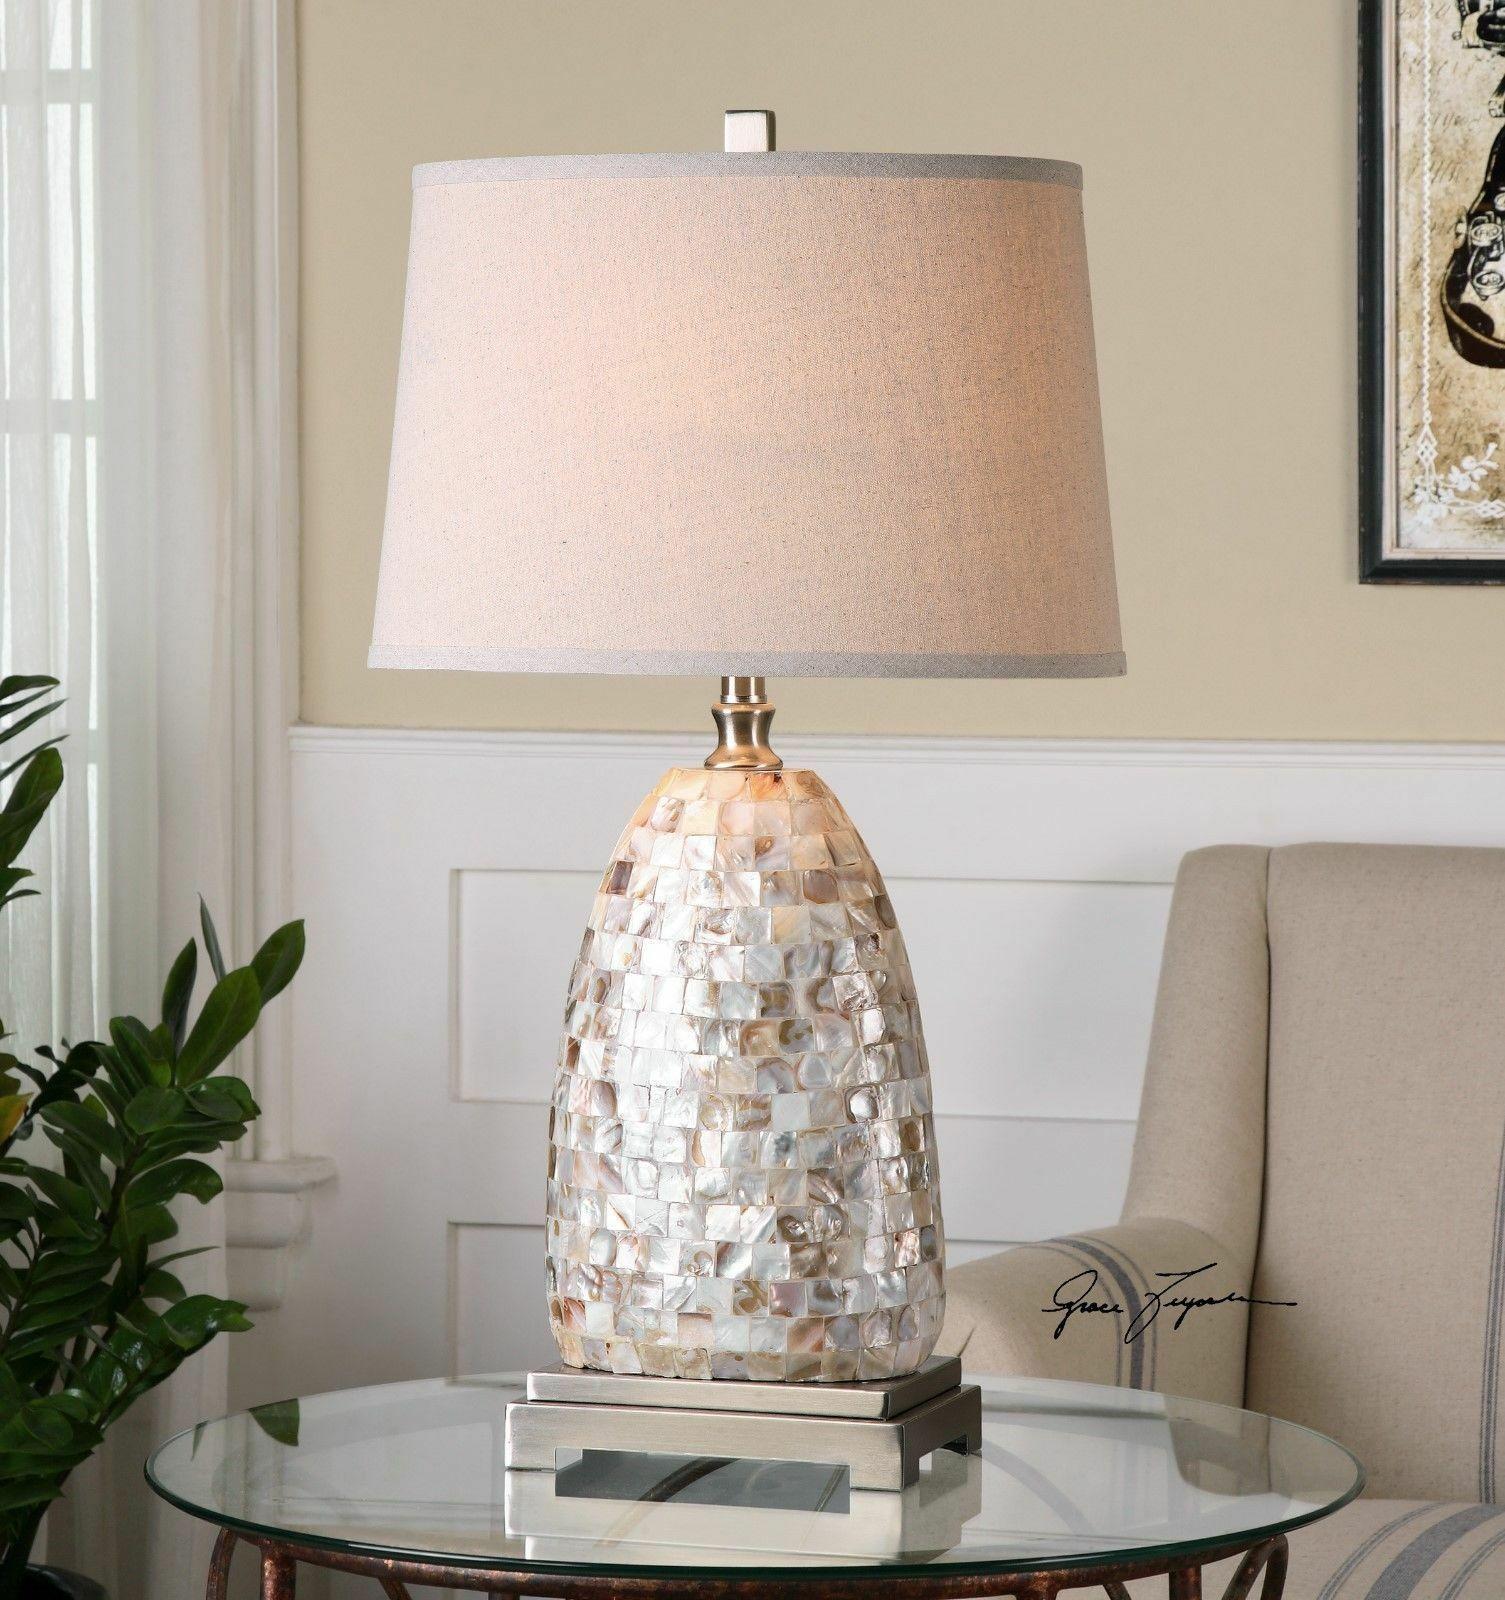 Mosaic Capiz Shell Tiles Table Lamp 30H Linen Shade Desk Light Nickel New